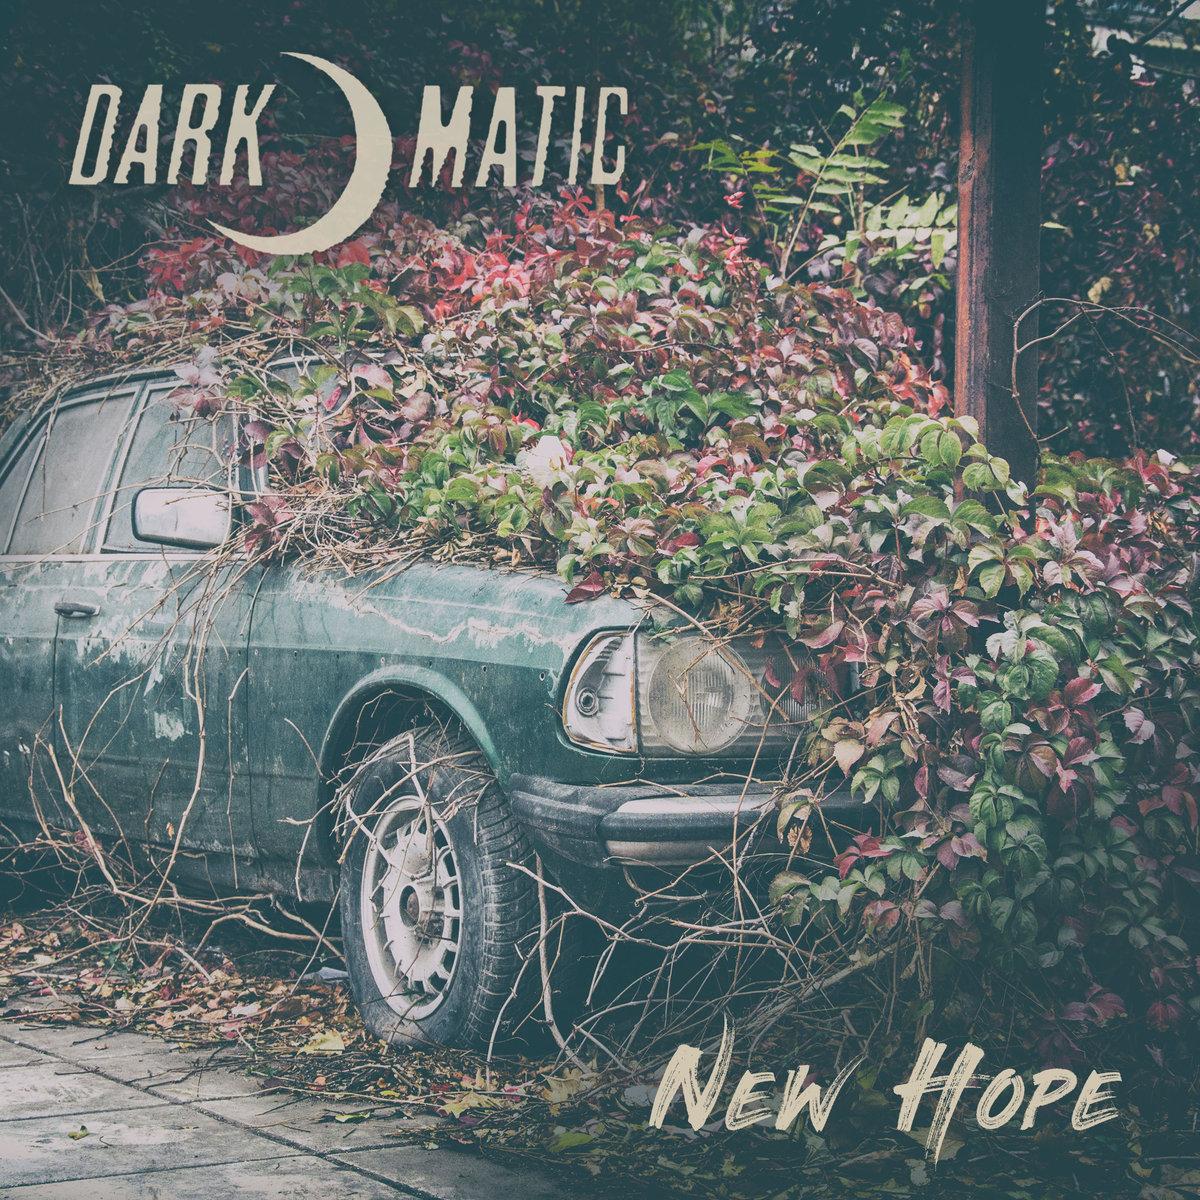 Electro News @ – Dark-o-matic – New Hope